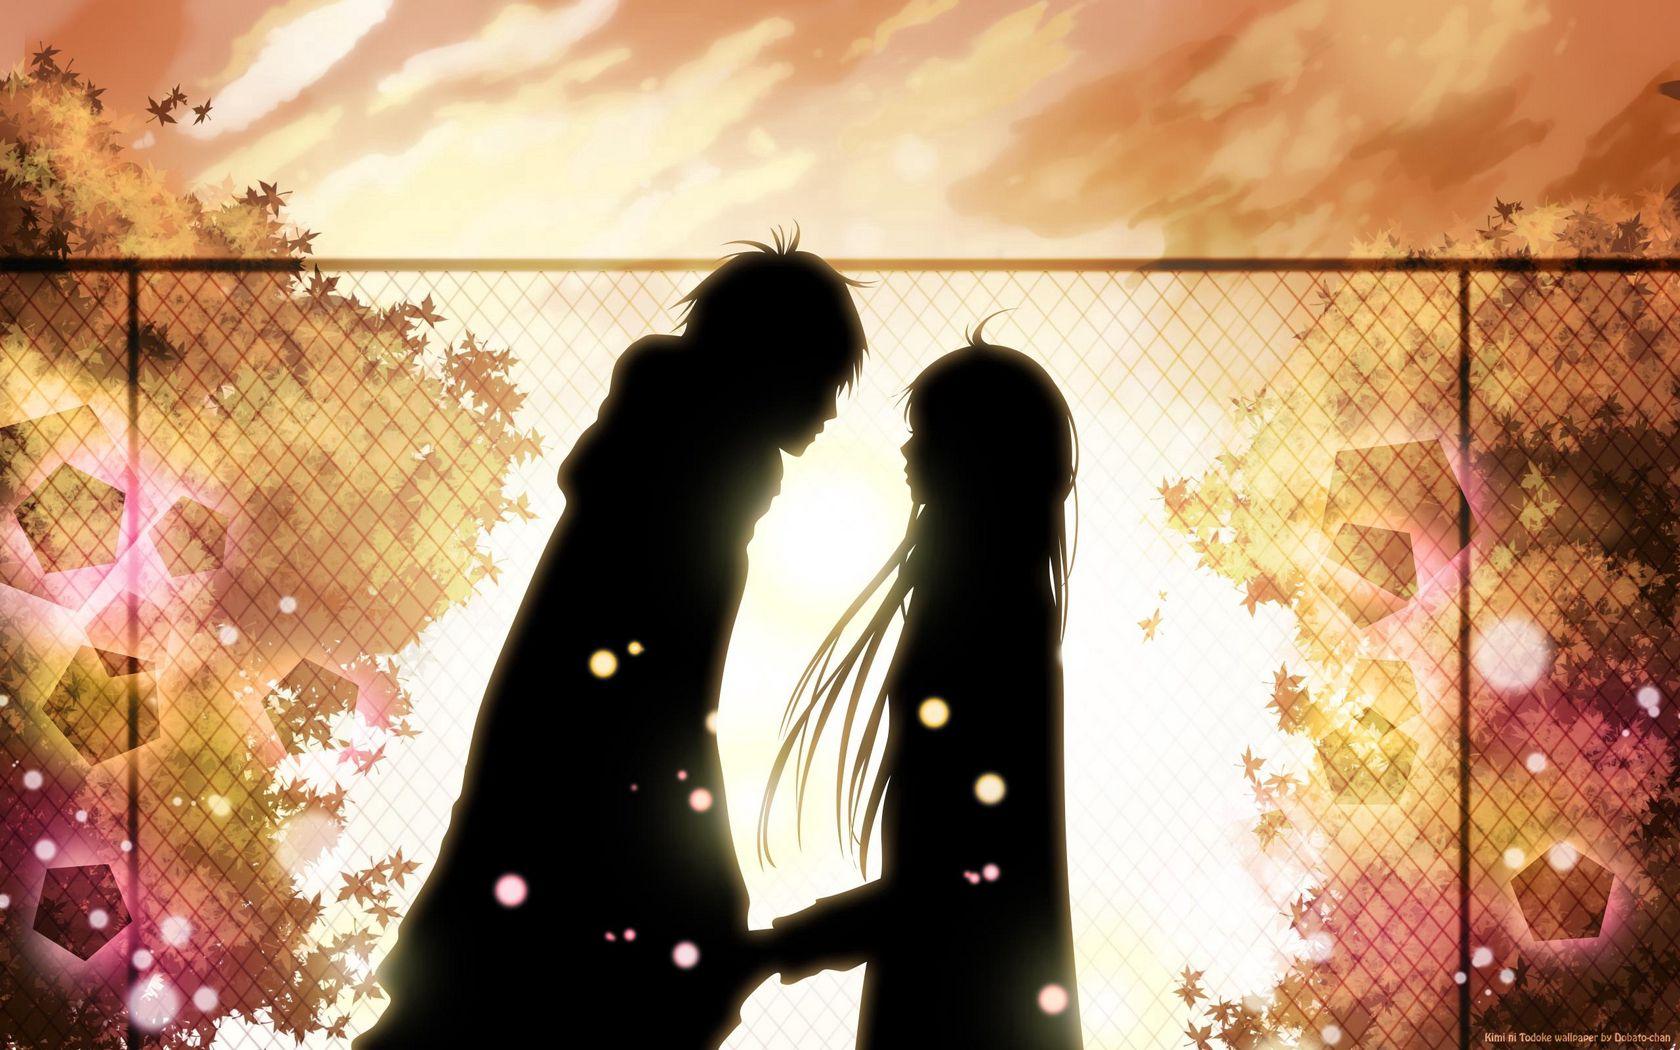 1680x1050 Wallpaper kimi ni todoke, girl, boy, love, feelings, meet, date, fall, leaves